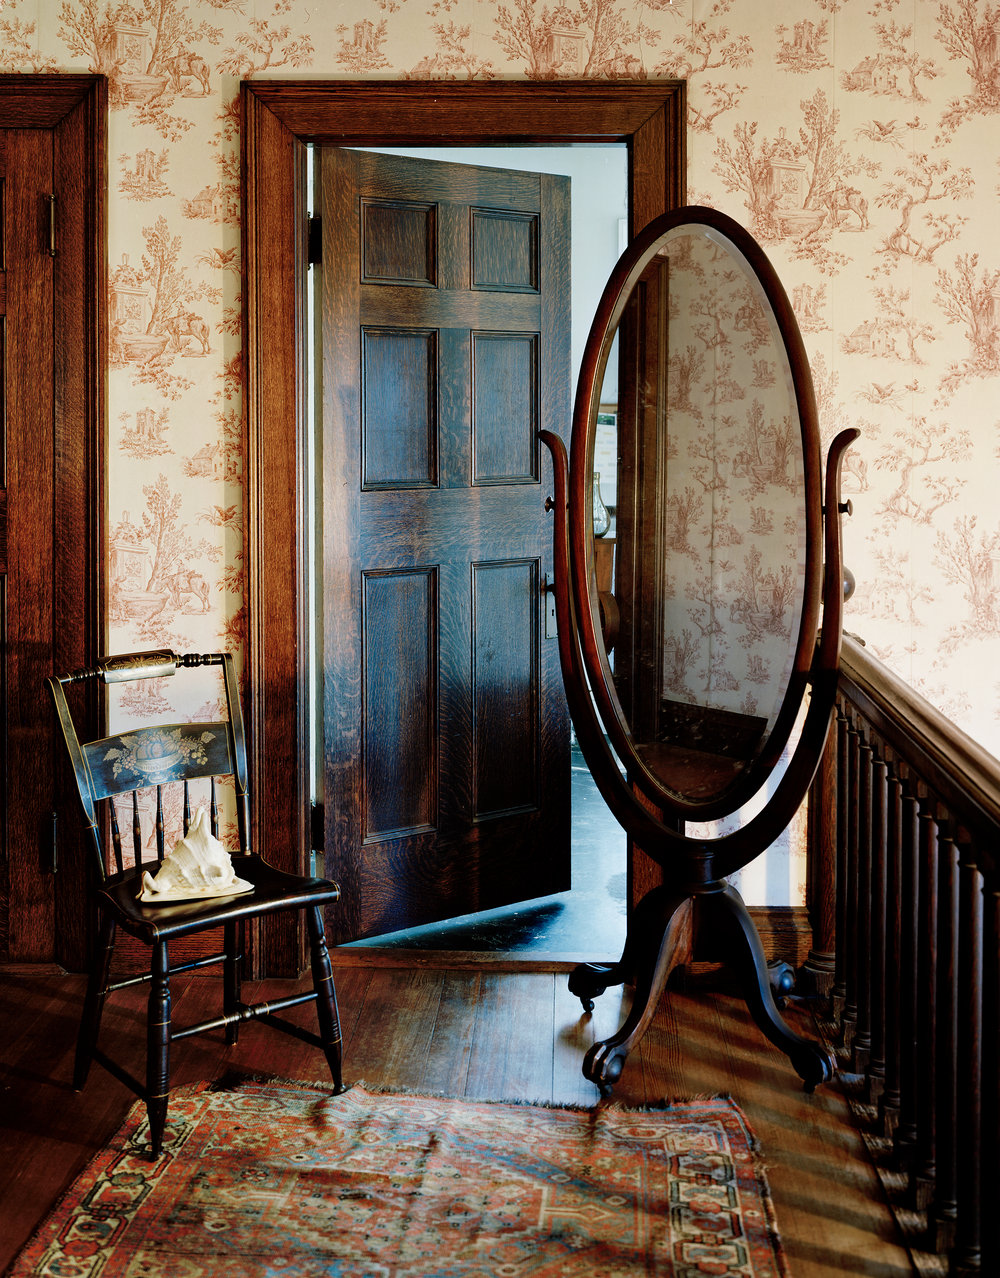 Mirror and Wall II, 2009